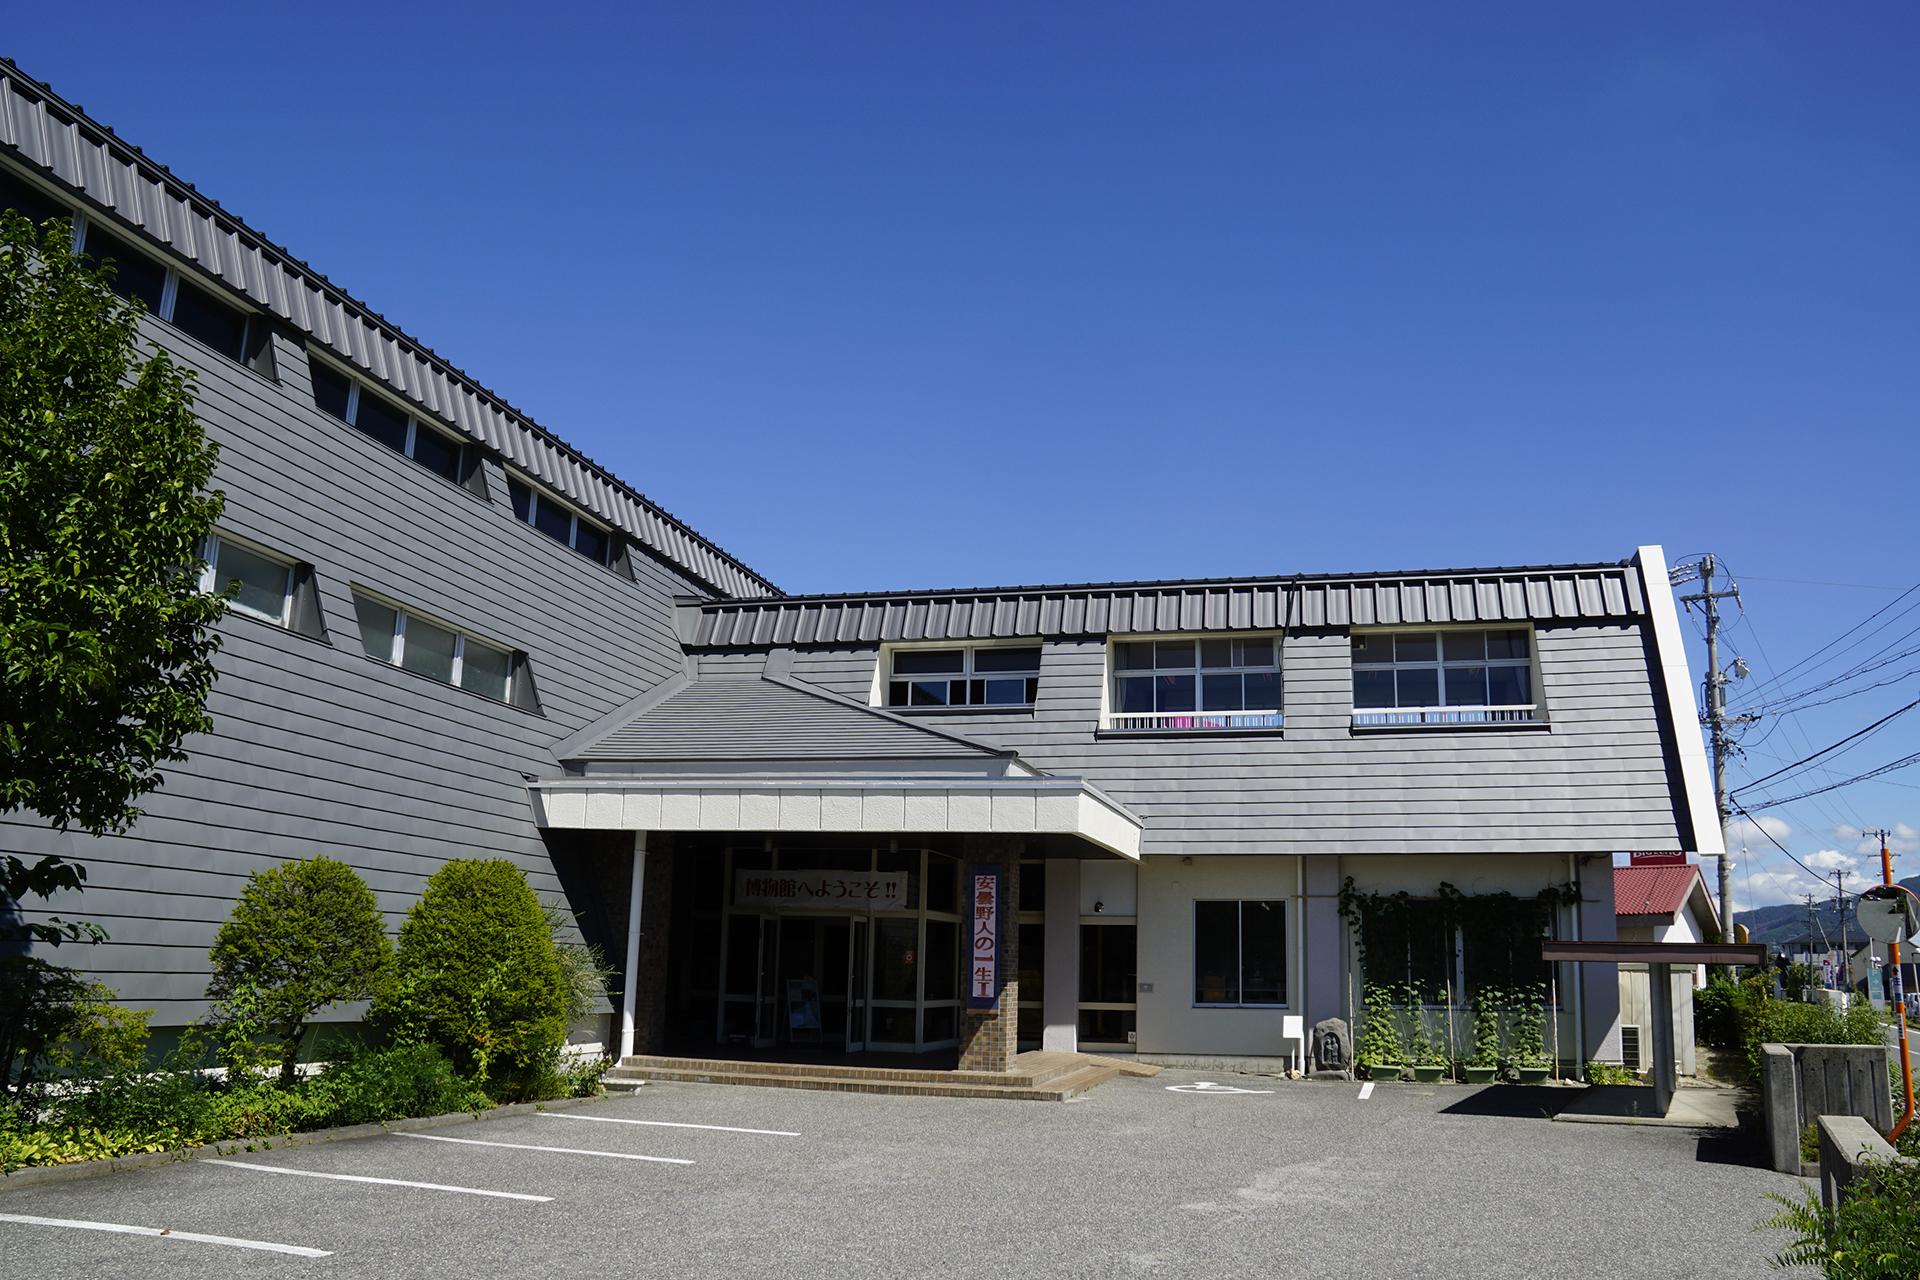 145_kyodoshiryokan